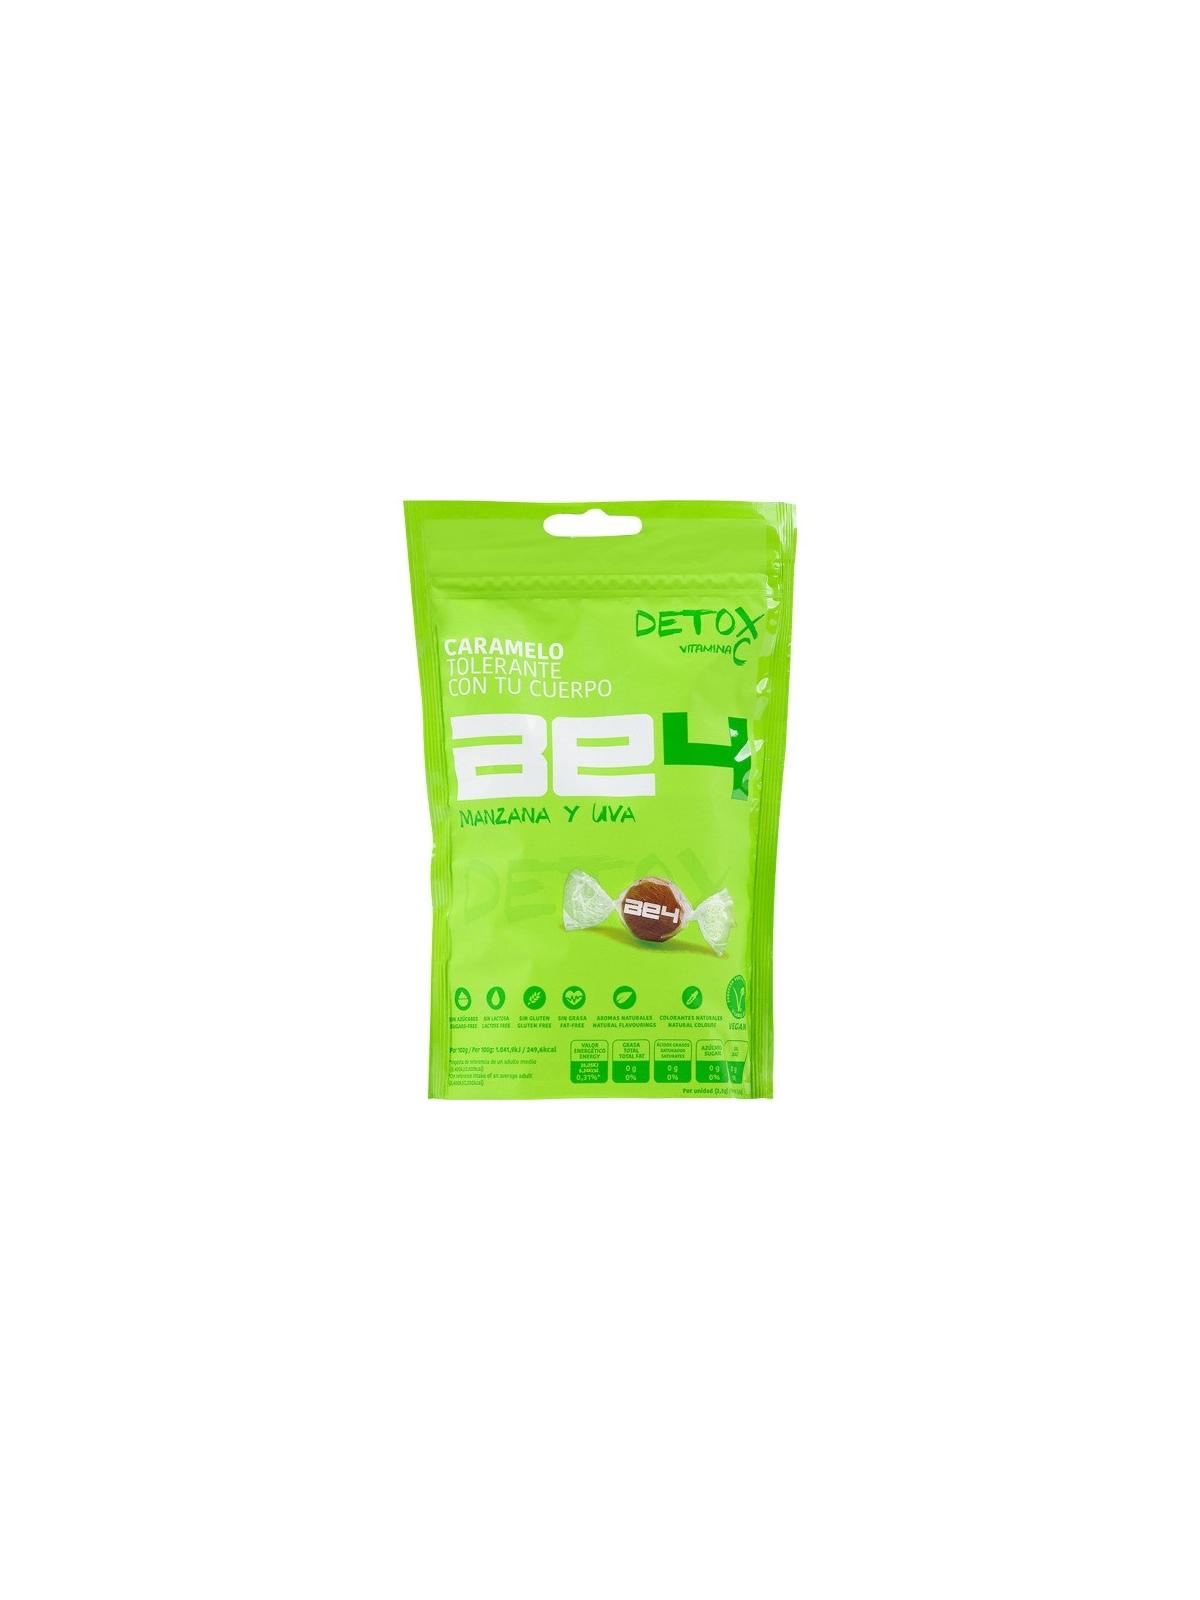 Be4 Detox